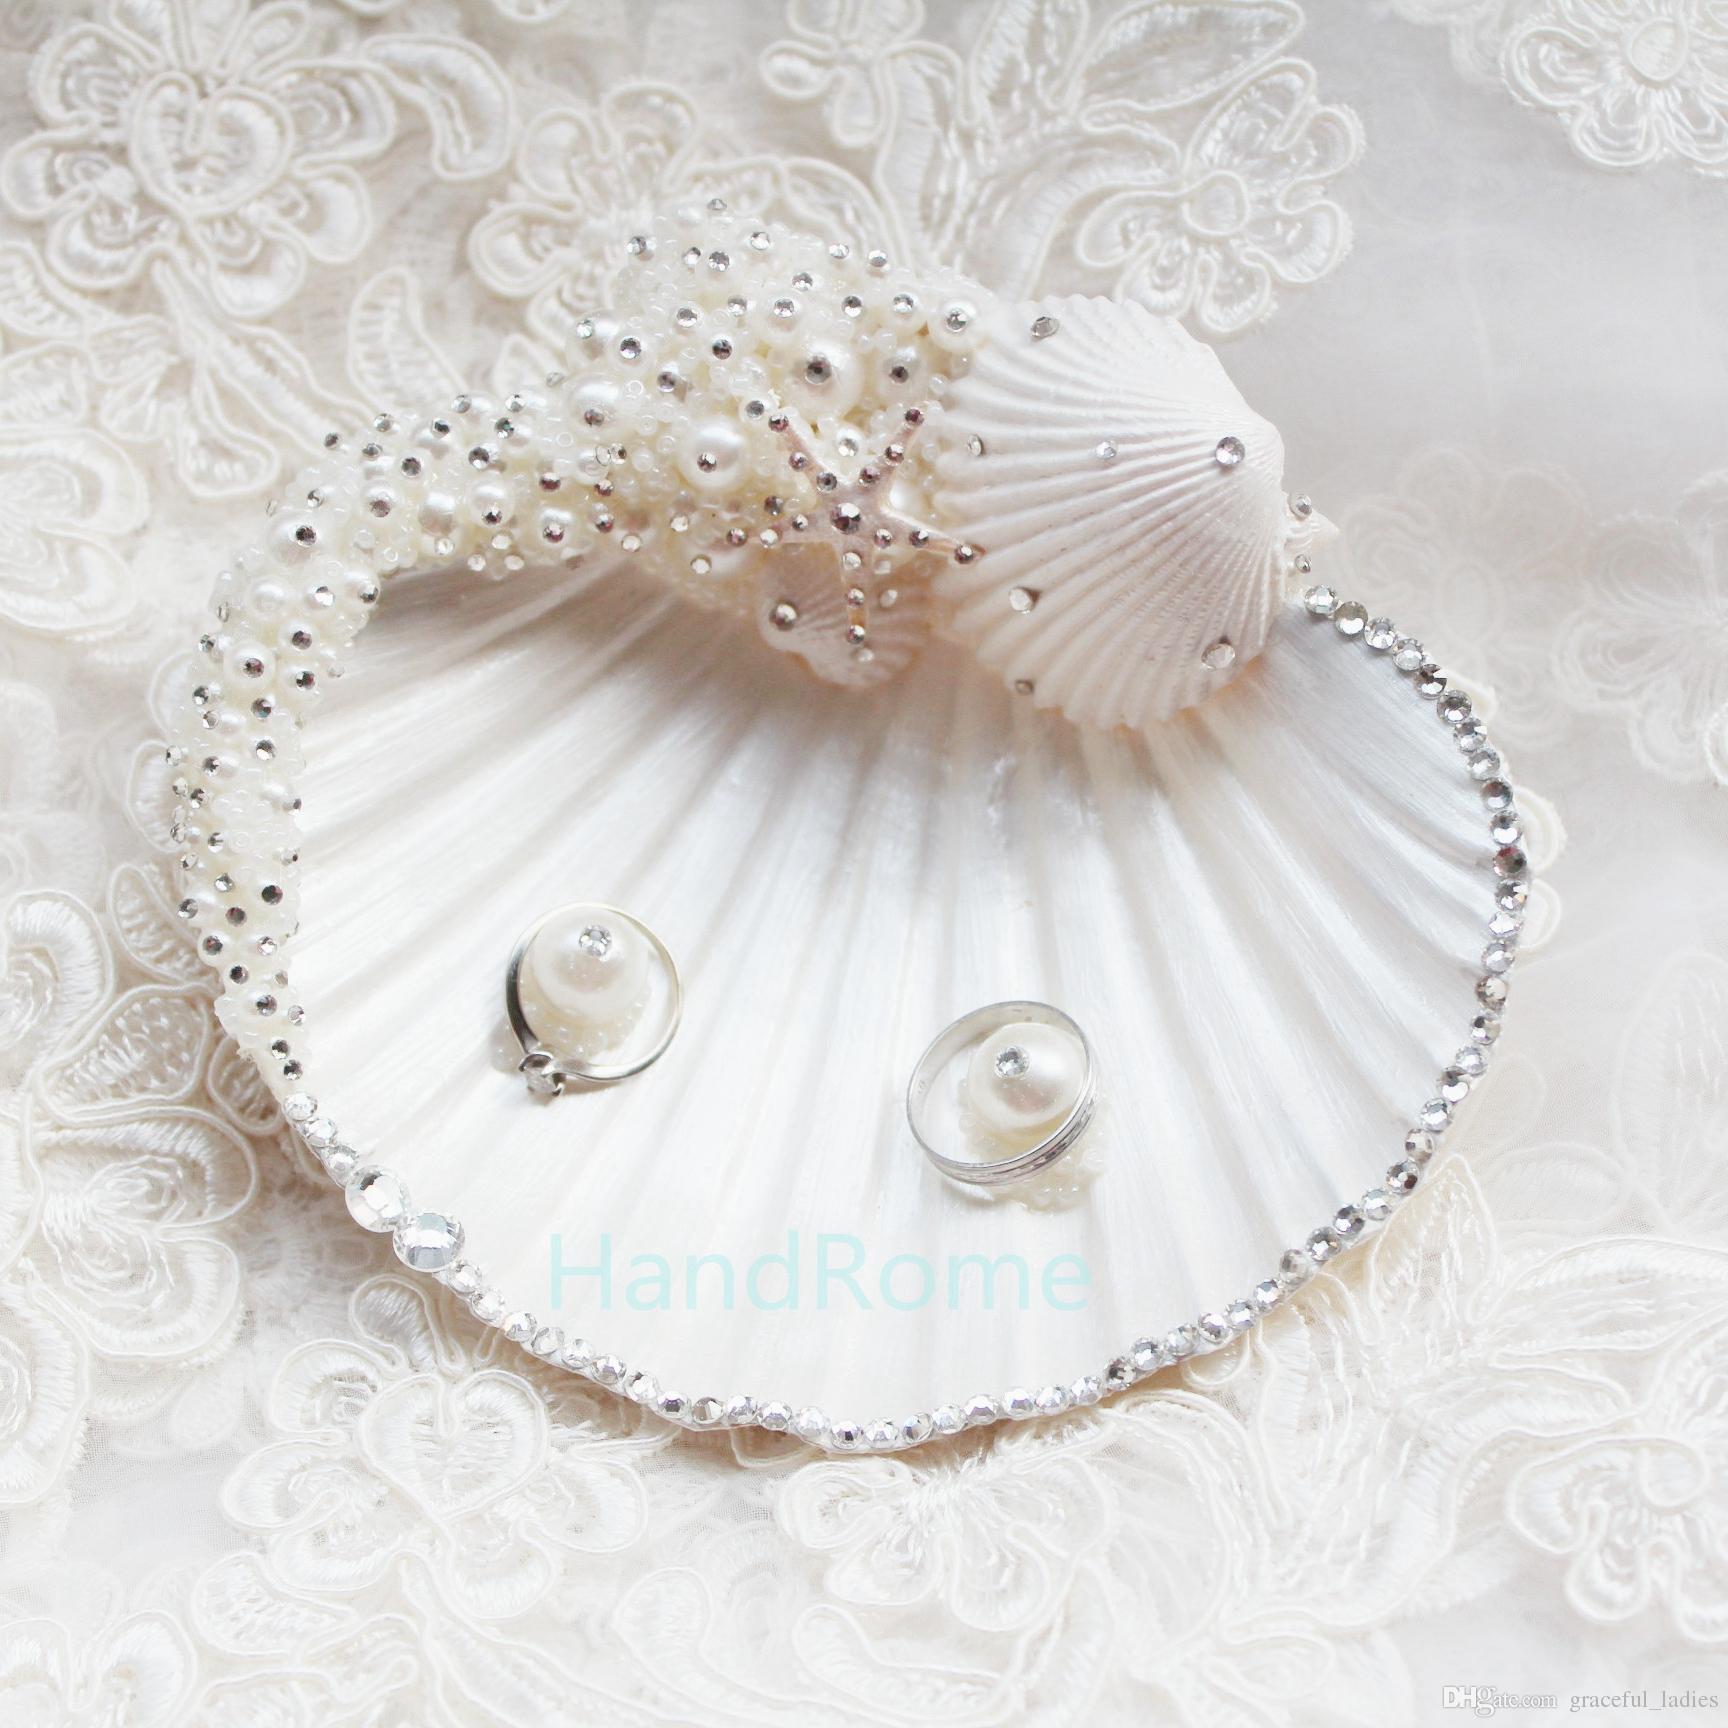 new weddings stewart ring pillow rebecca pillows martha wedding vert david stylish york